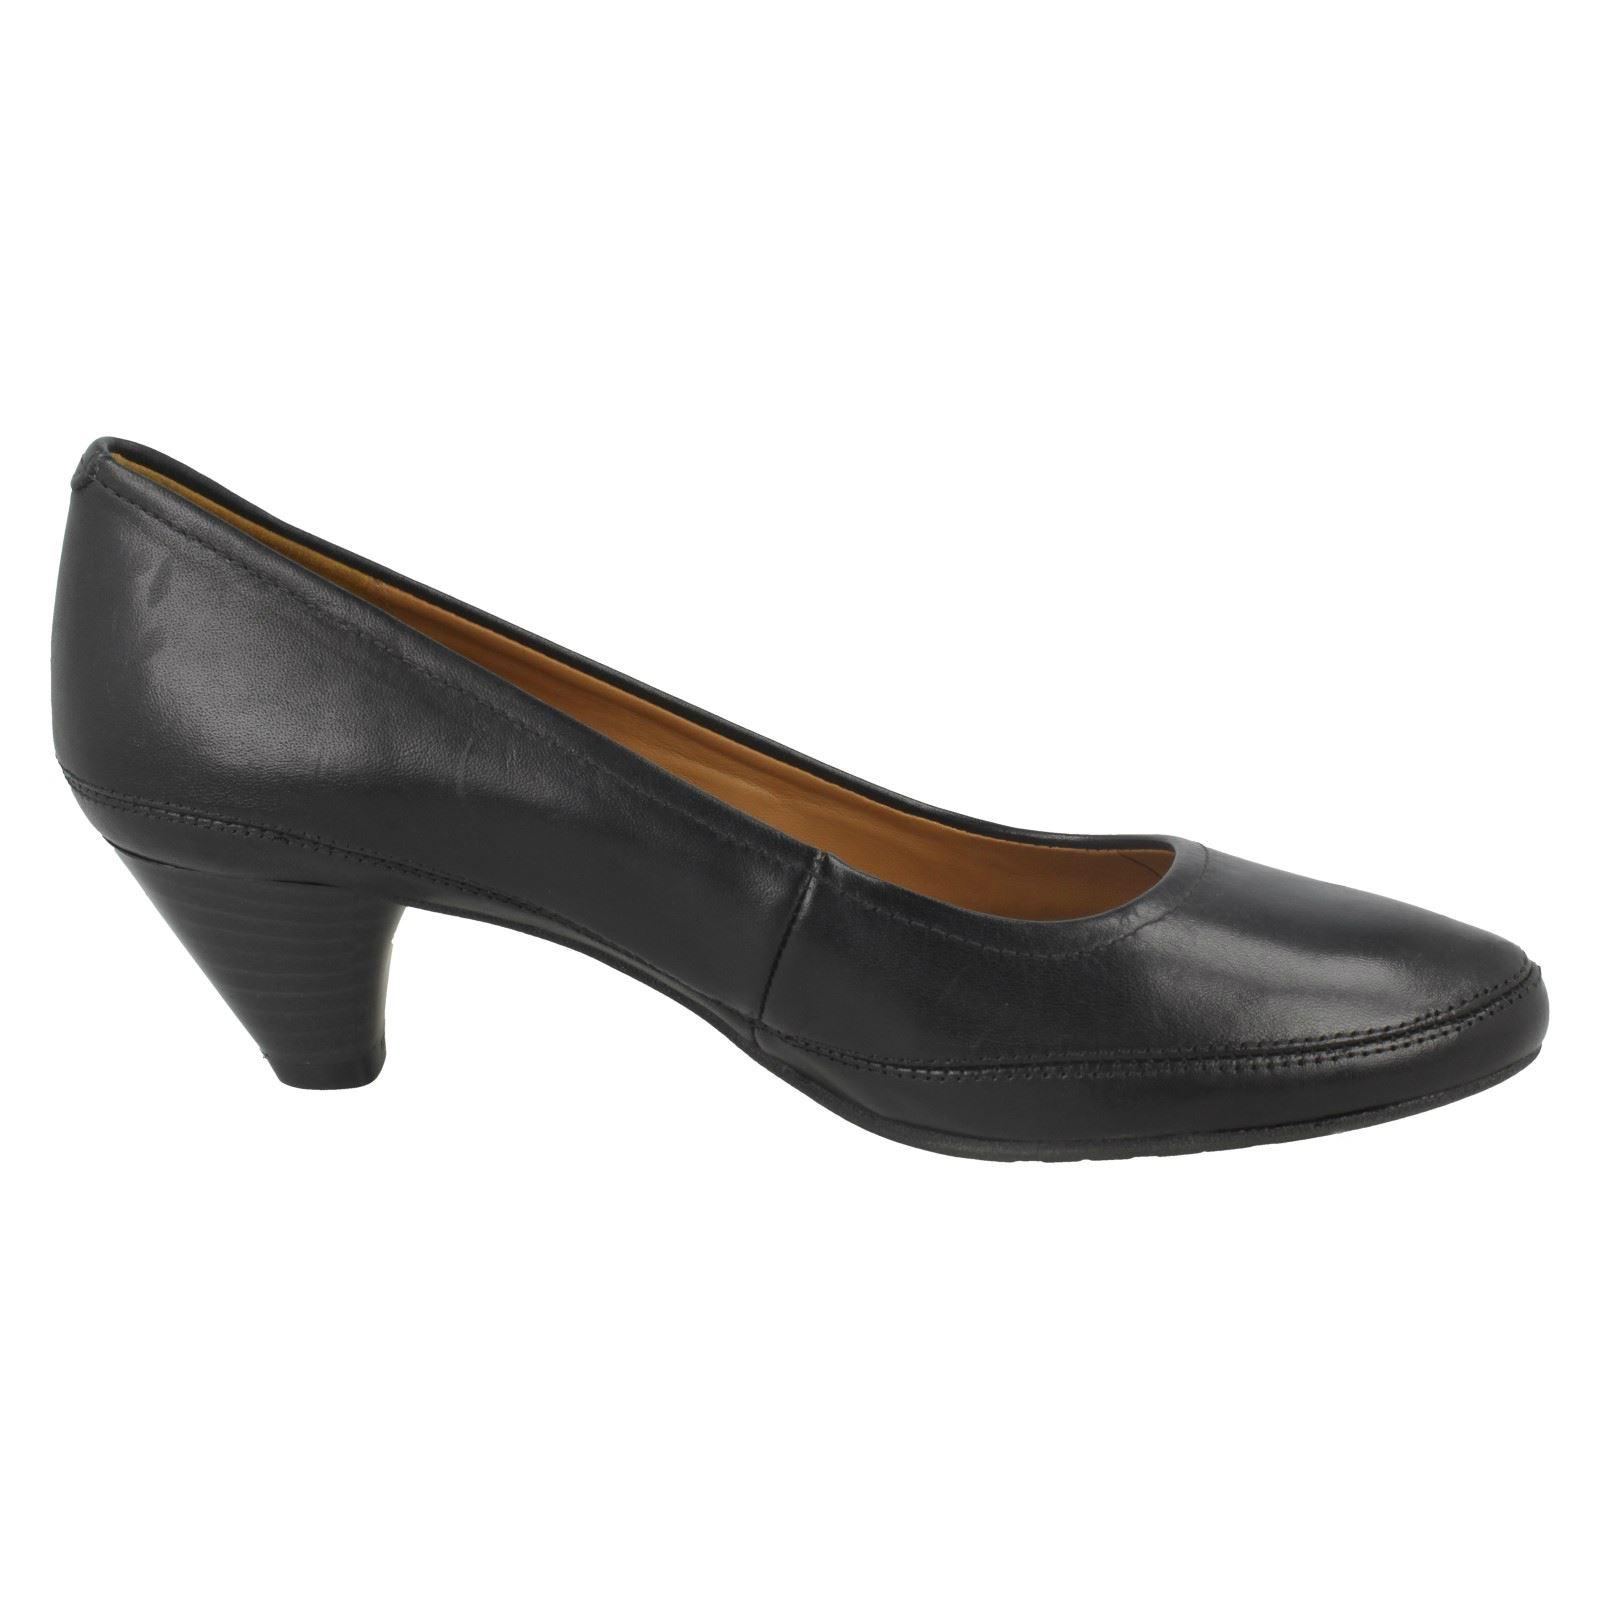 Clarks Scarpe Eleganti Smart Donna Donna Donna Denny Mellow 530f52